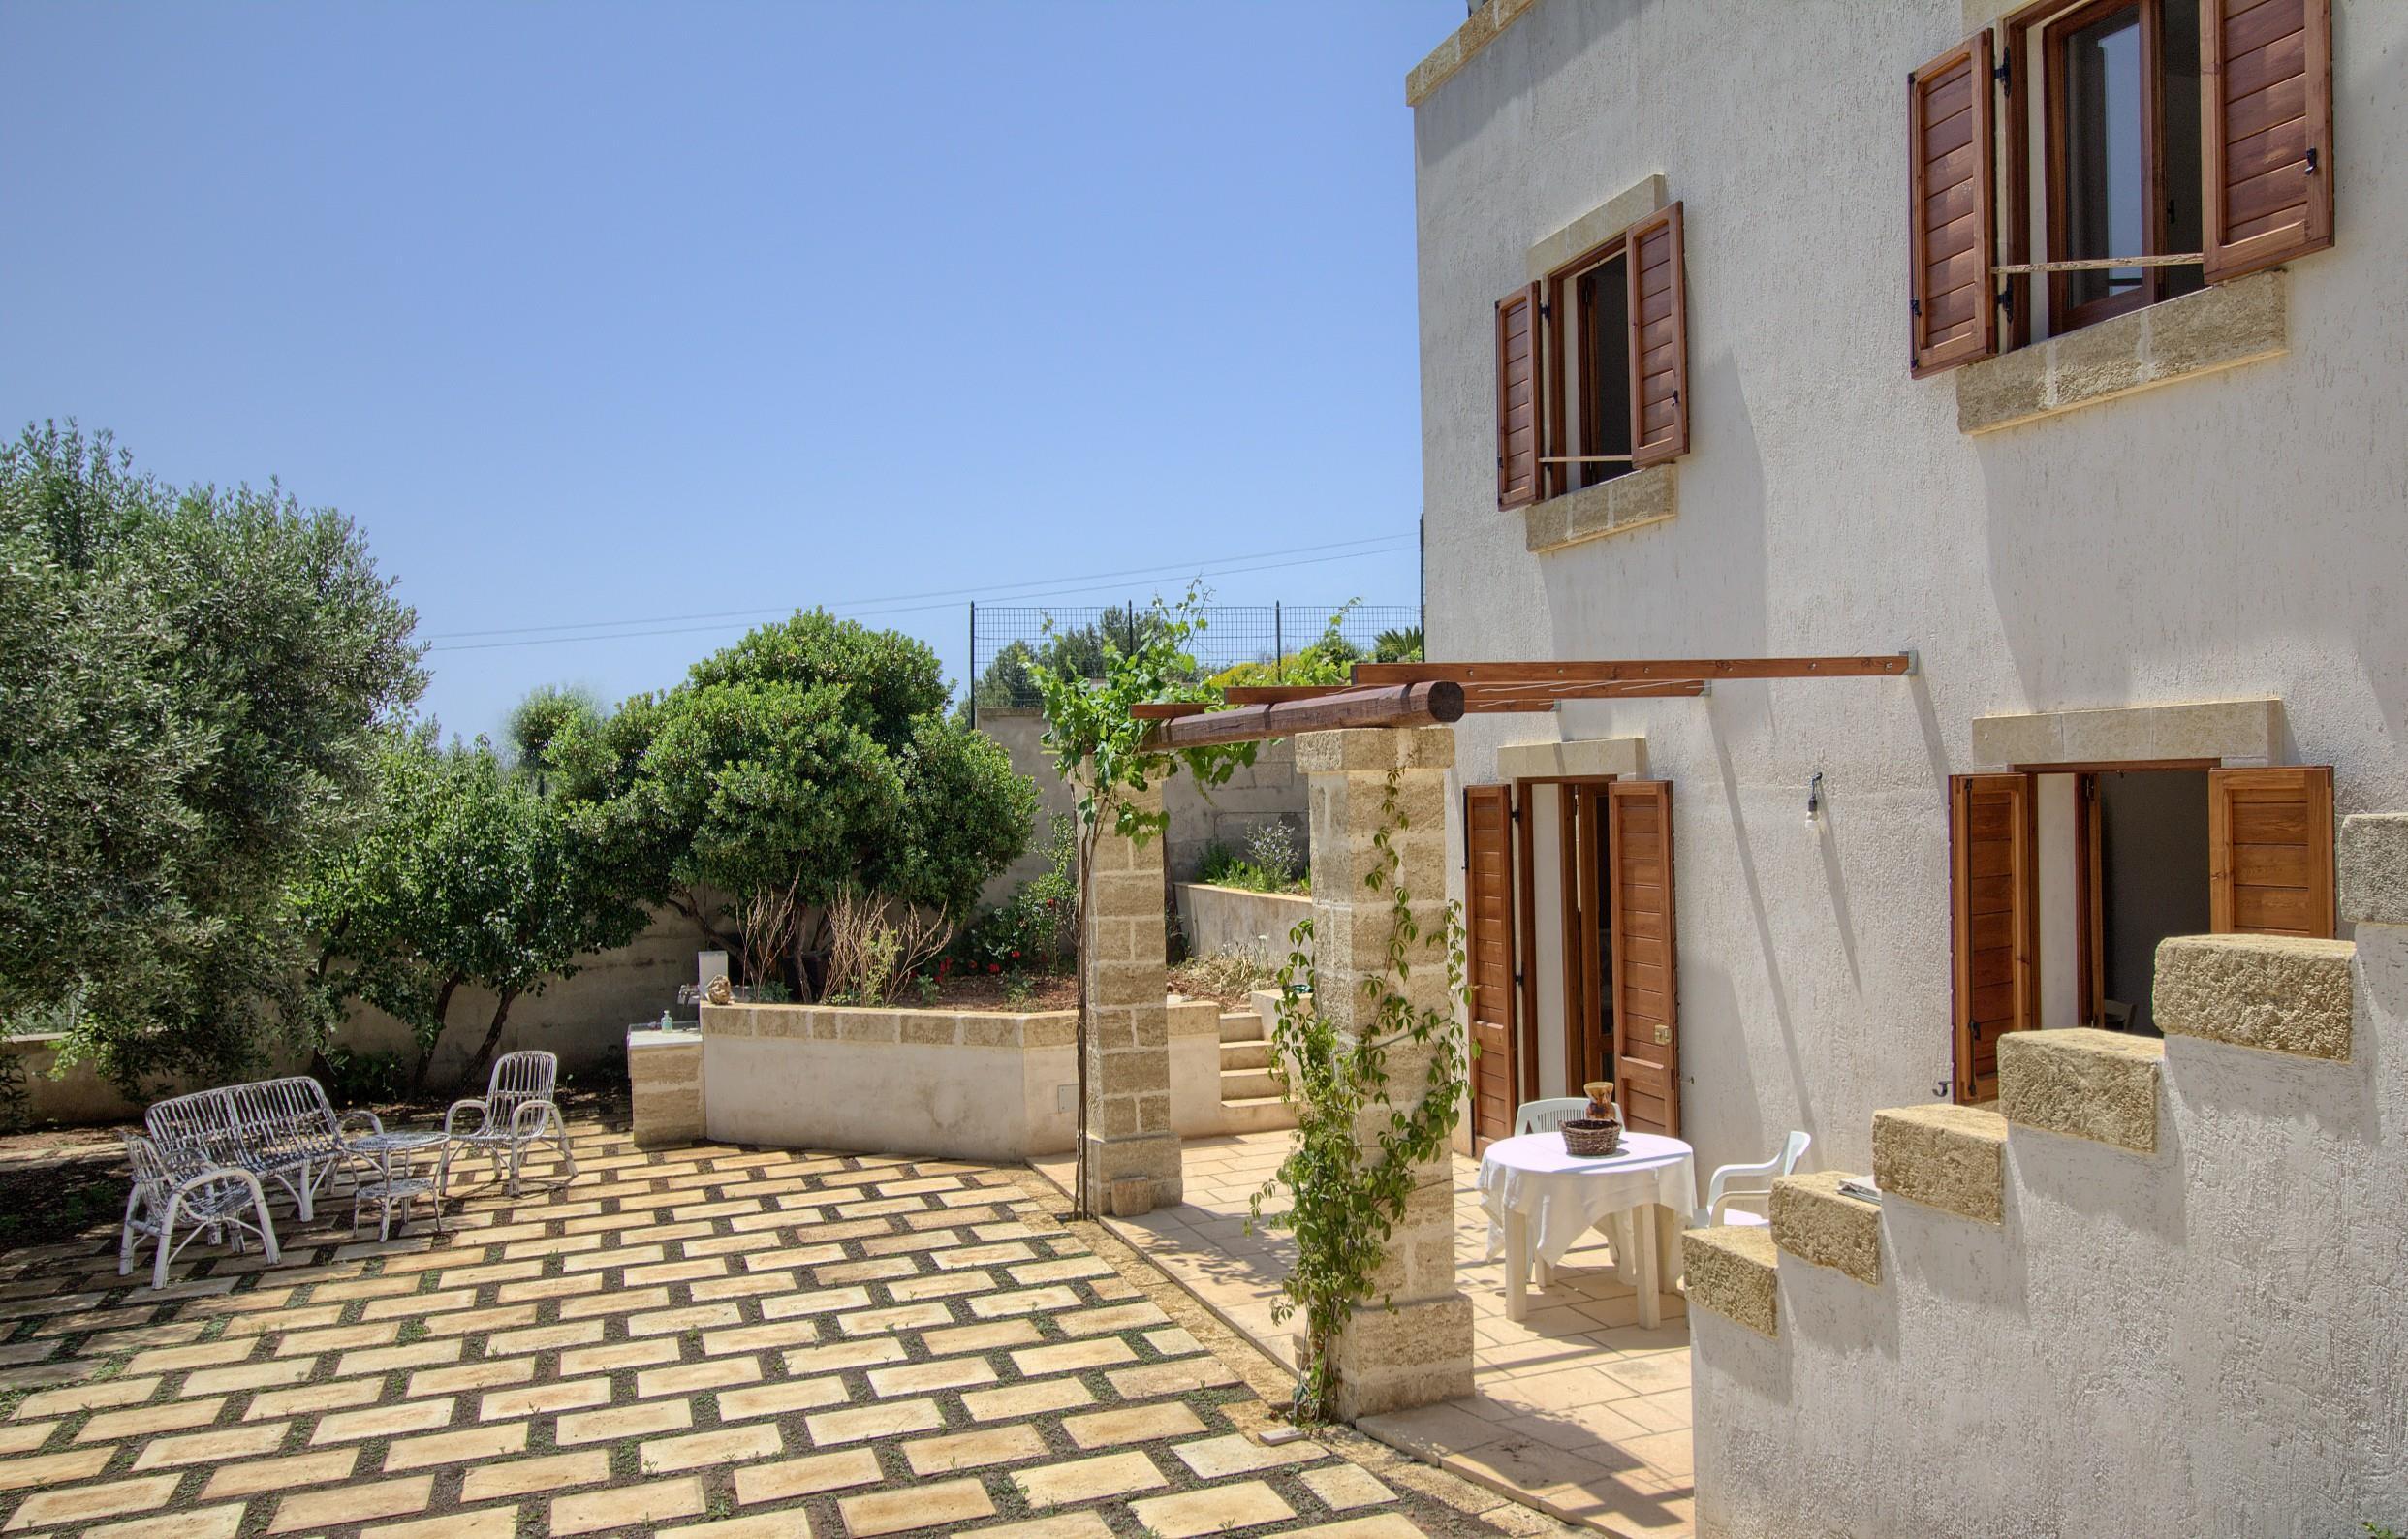 Ca Masci lovely house photo 16848857